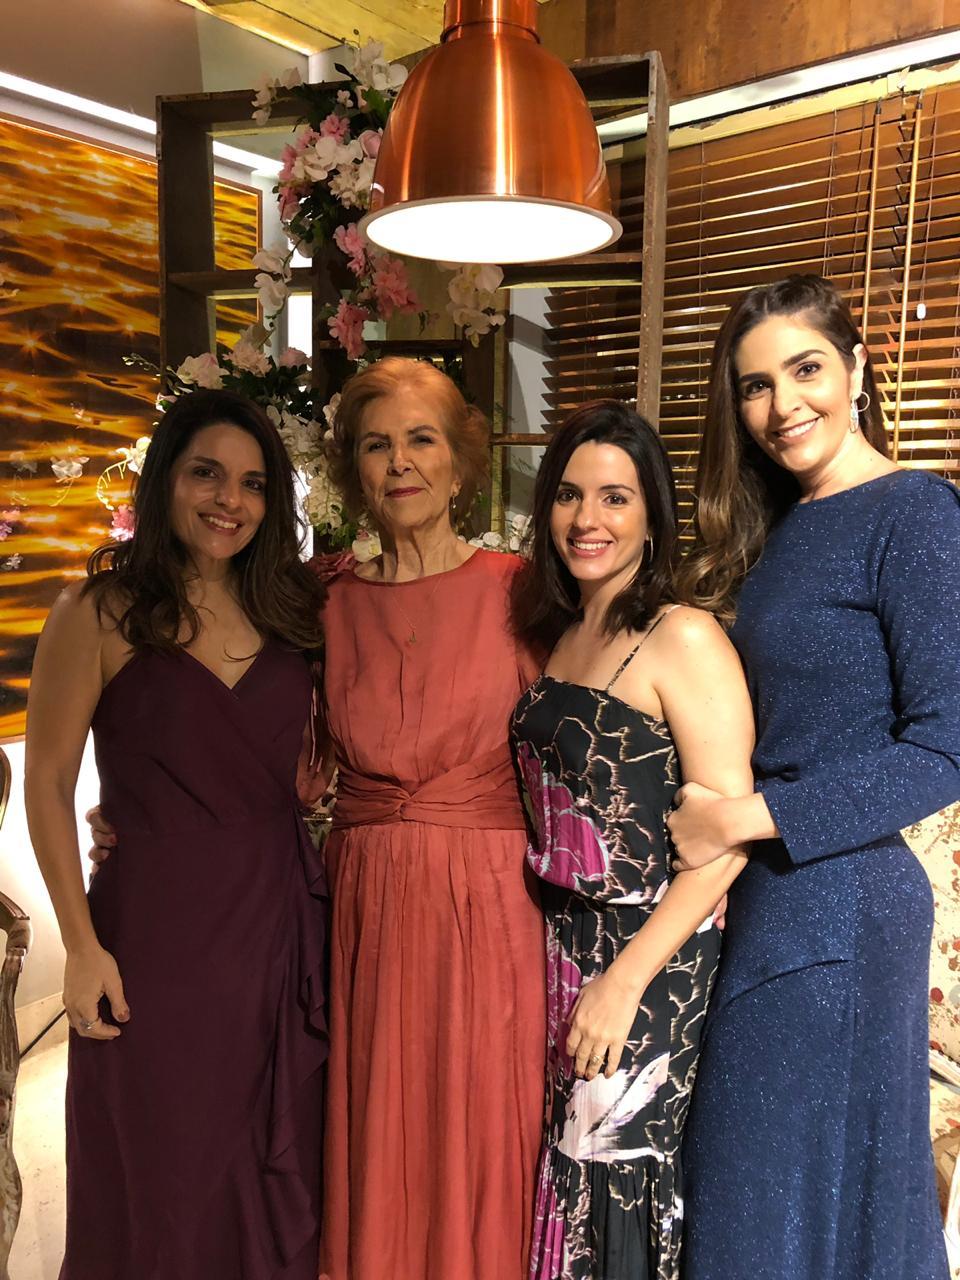 Daniela Rocha, Cristiana Baiardi e Maria Silvana Mascarenhas